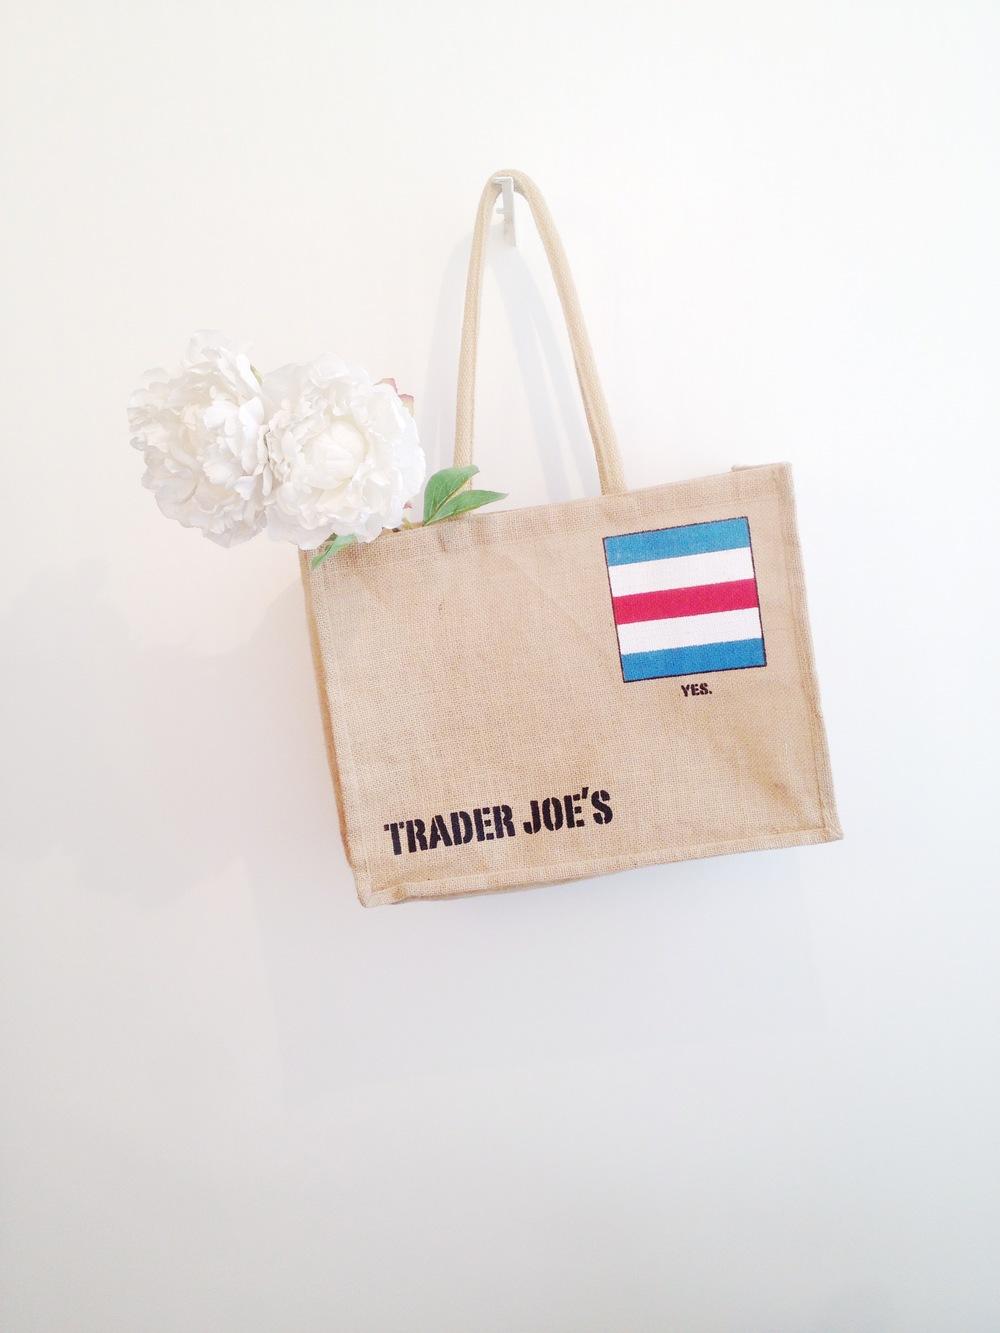 [[Talking reusable bags on Apartment Therapy. Pictured : The reusable bag I bought from Trader Joe's last November in LA///A propos de sacs réutilisables sur Apartment Therapy. Photo : le sac réutilisable que j'ai acheté chez Trader Joe's à LA en novembre dernier]]